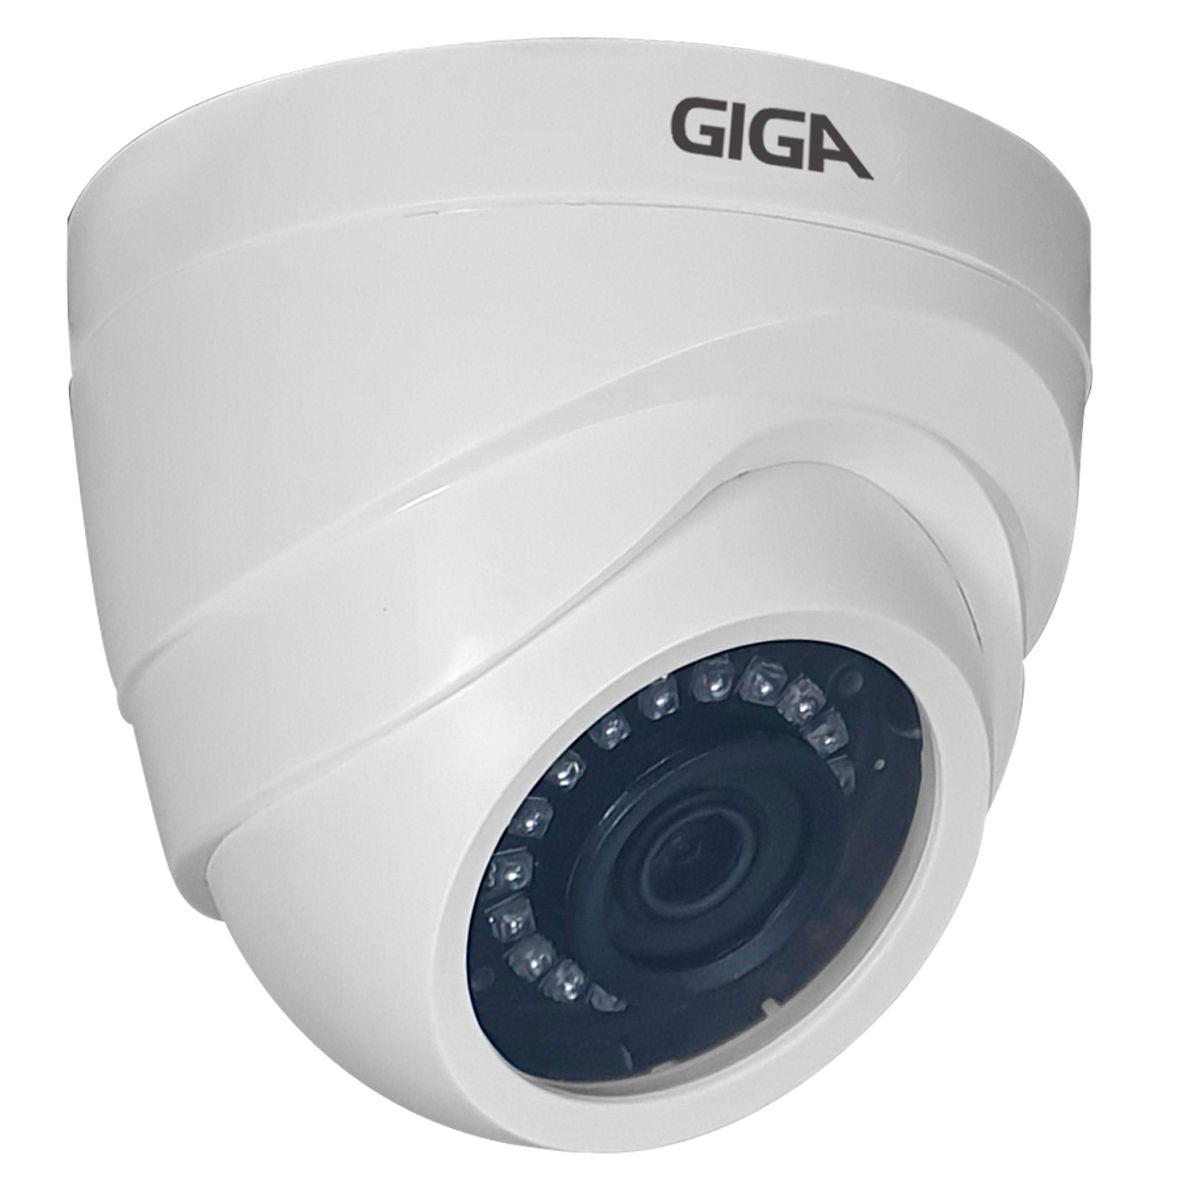 Kit Orion Giga Security 16 Câmeras HD 720p GS0019 + DVR Full HD + Acessórios  - Tudo Forte